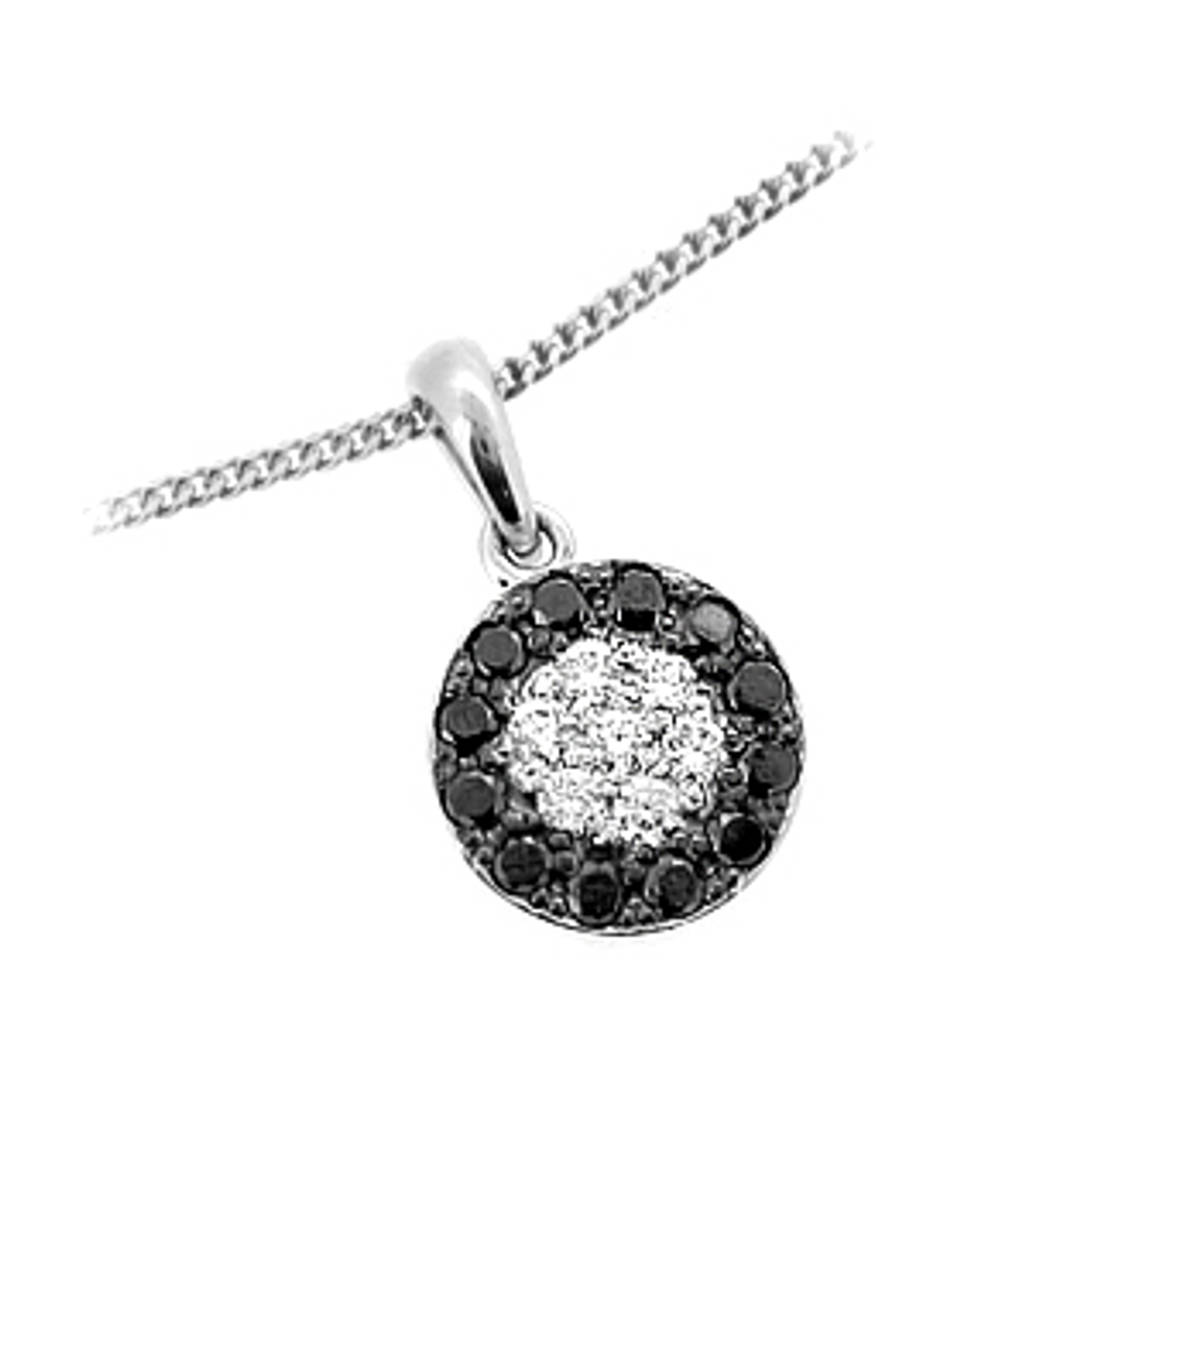 "18k white gold black diamond & white diamond cluster pendant on 18k white gold 18"" chainDETAILStotal white diamond weight 0.21ctstotal black diamond weight 0.36cts SIZE & FITPendant width  1.1cmPendant length including loop  2cm"